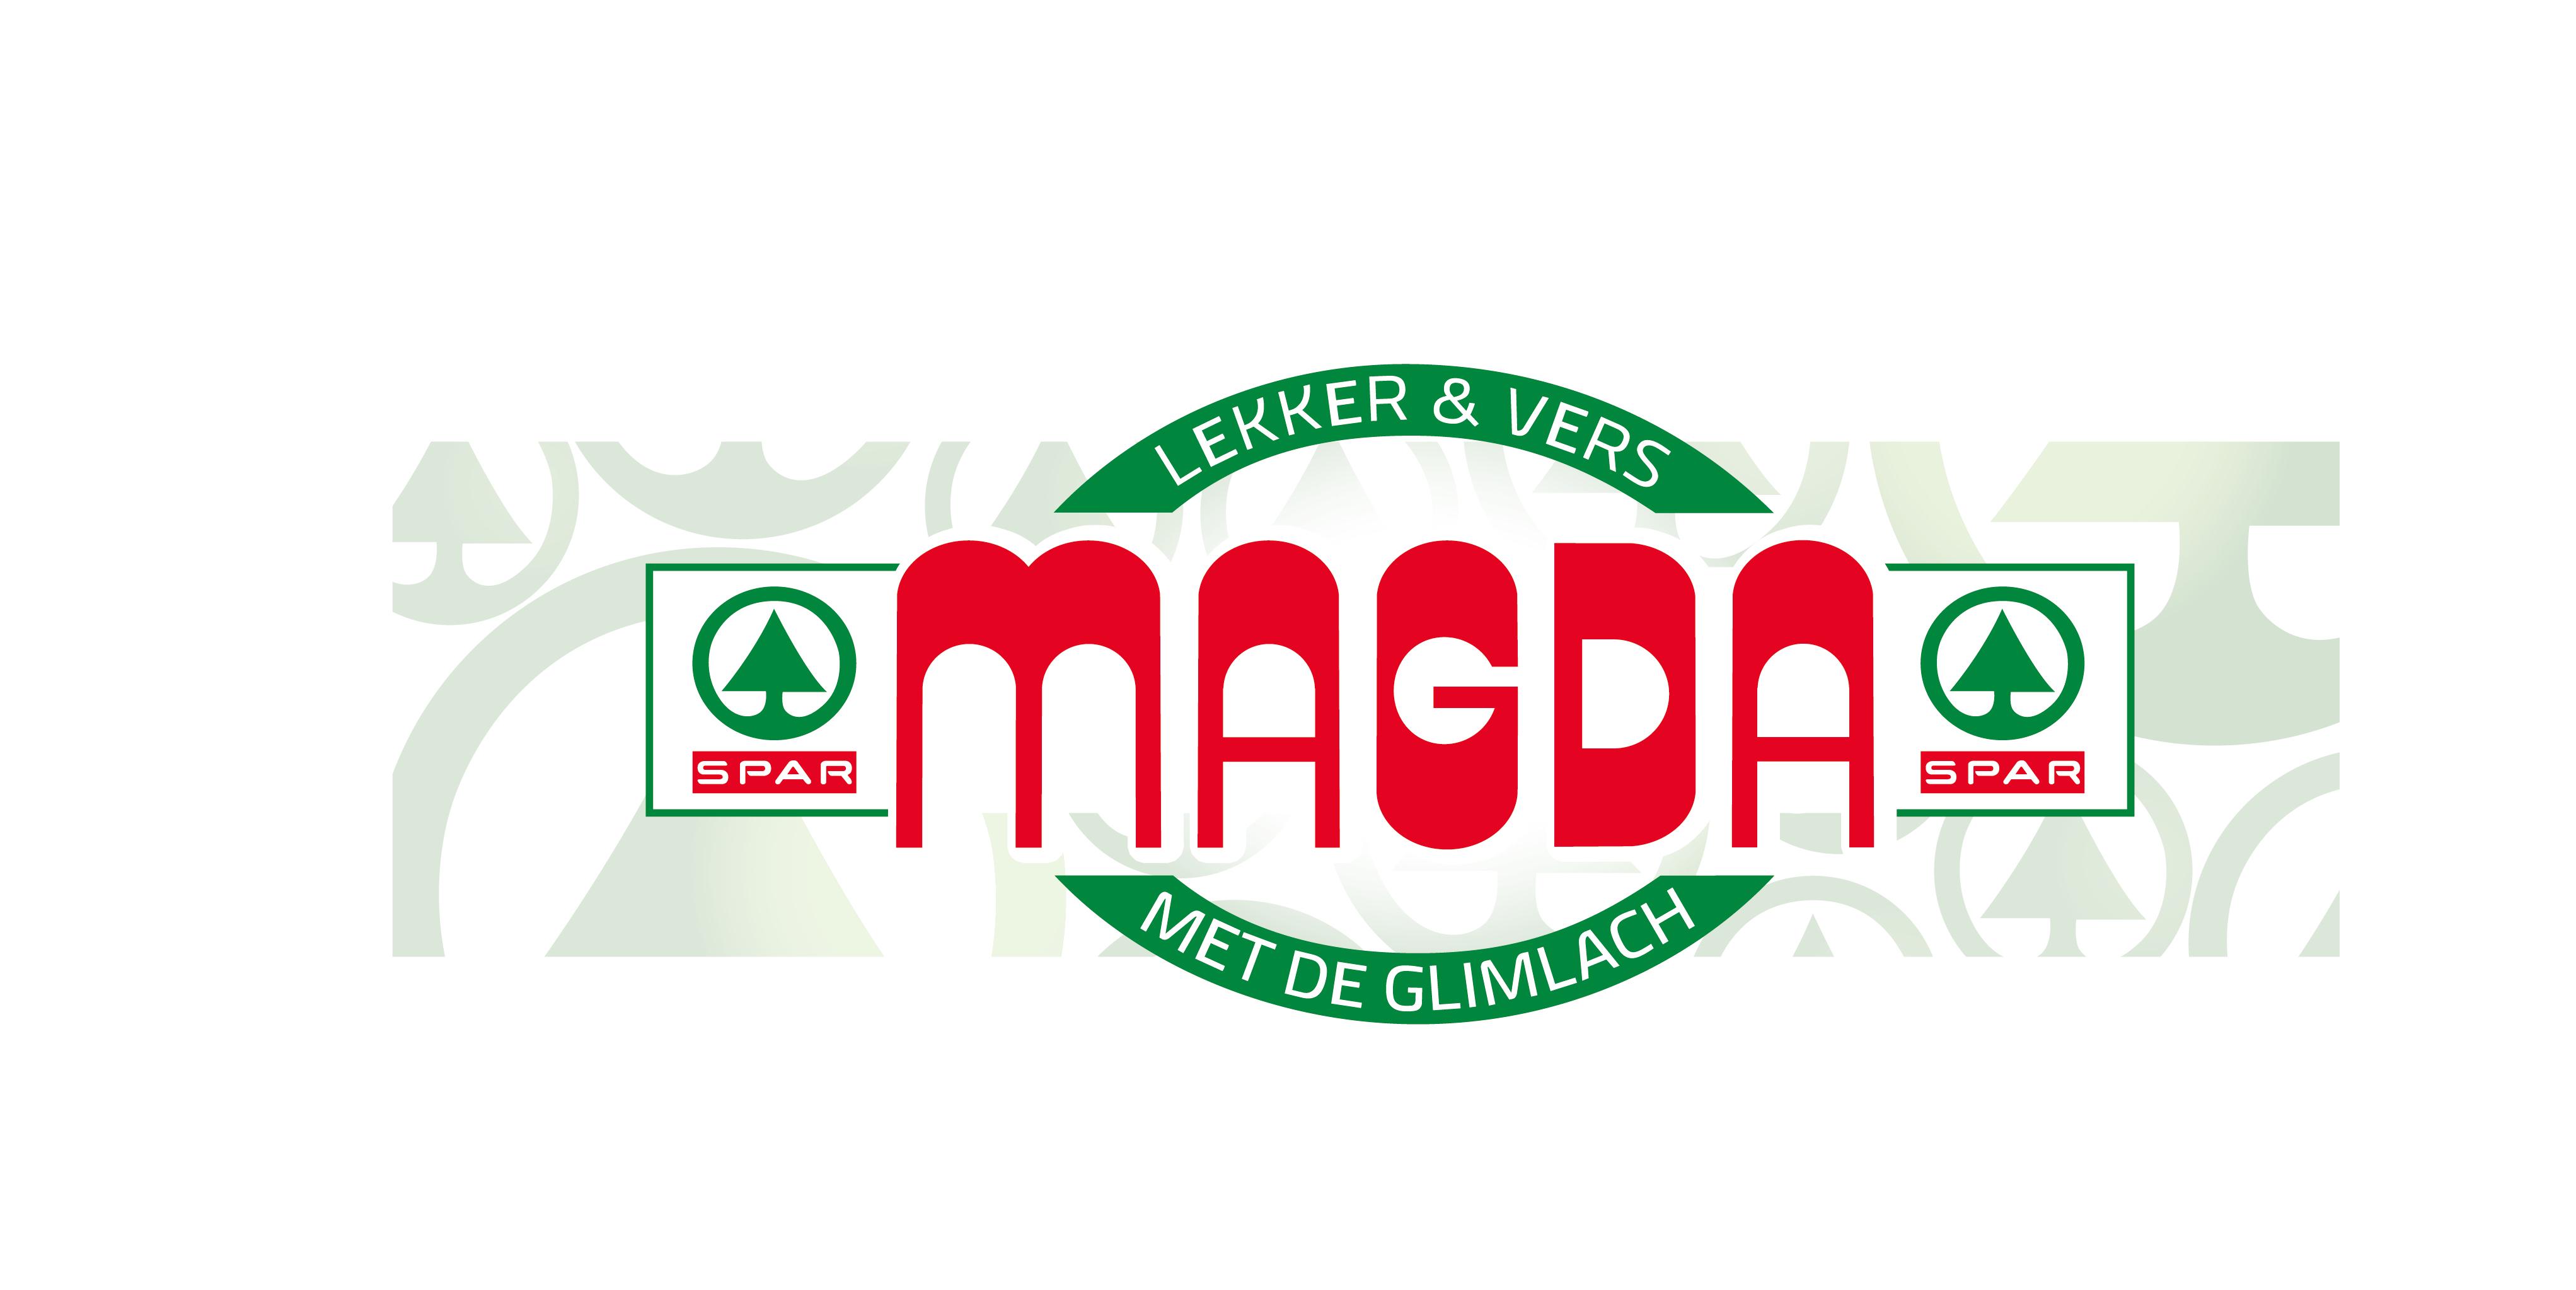 De Magda